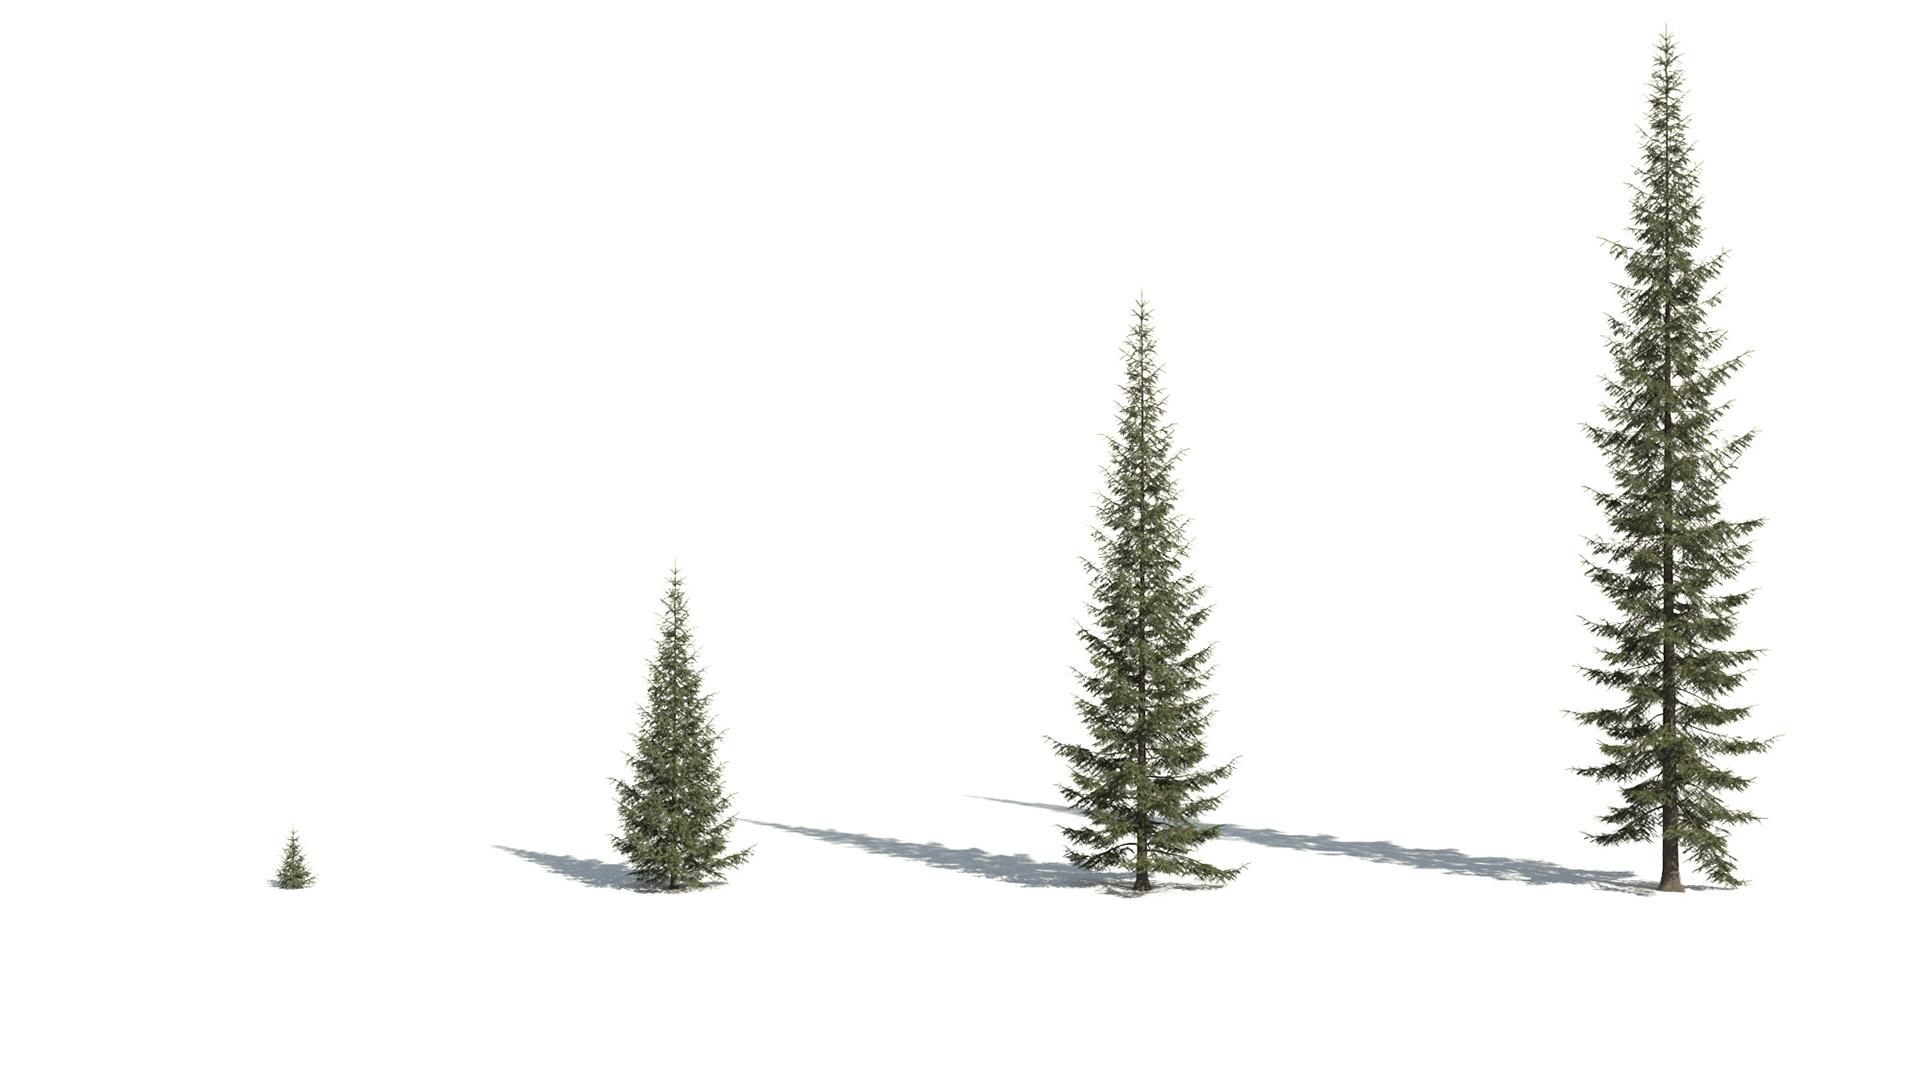 3D model of the Engelmann spruce Picea engelmannii maturity variations